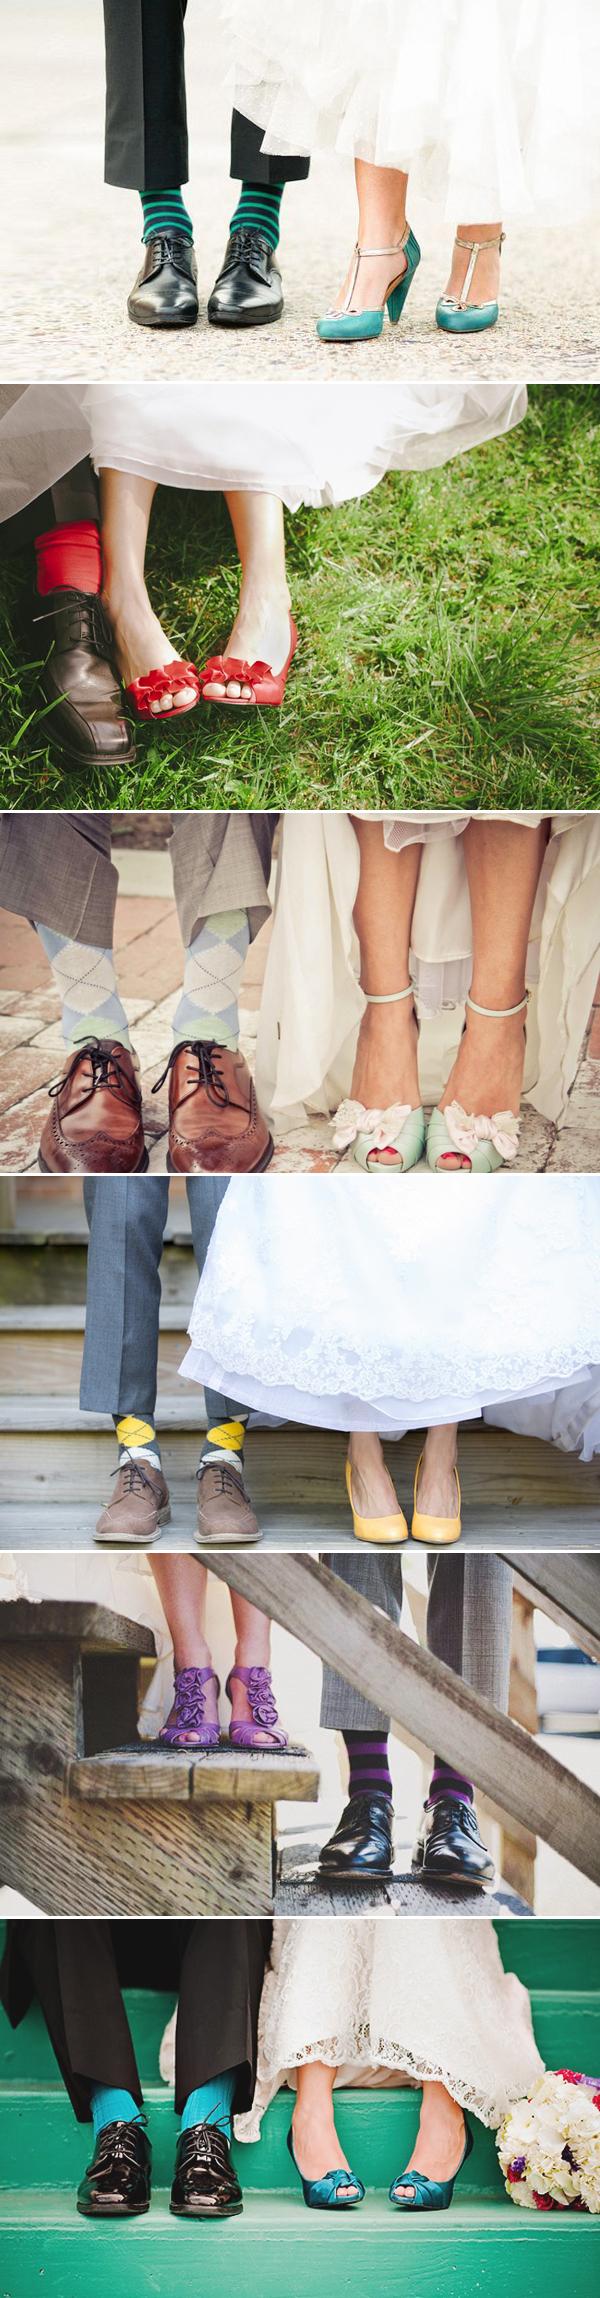 shoepair01-socksshoes